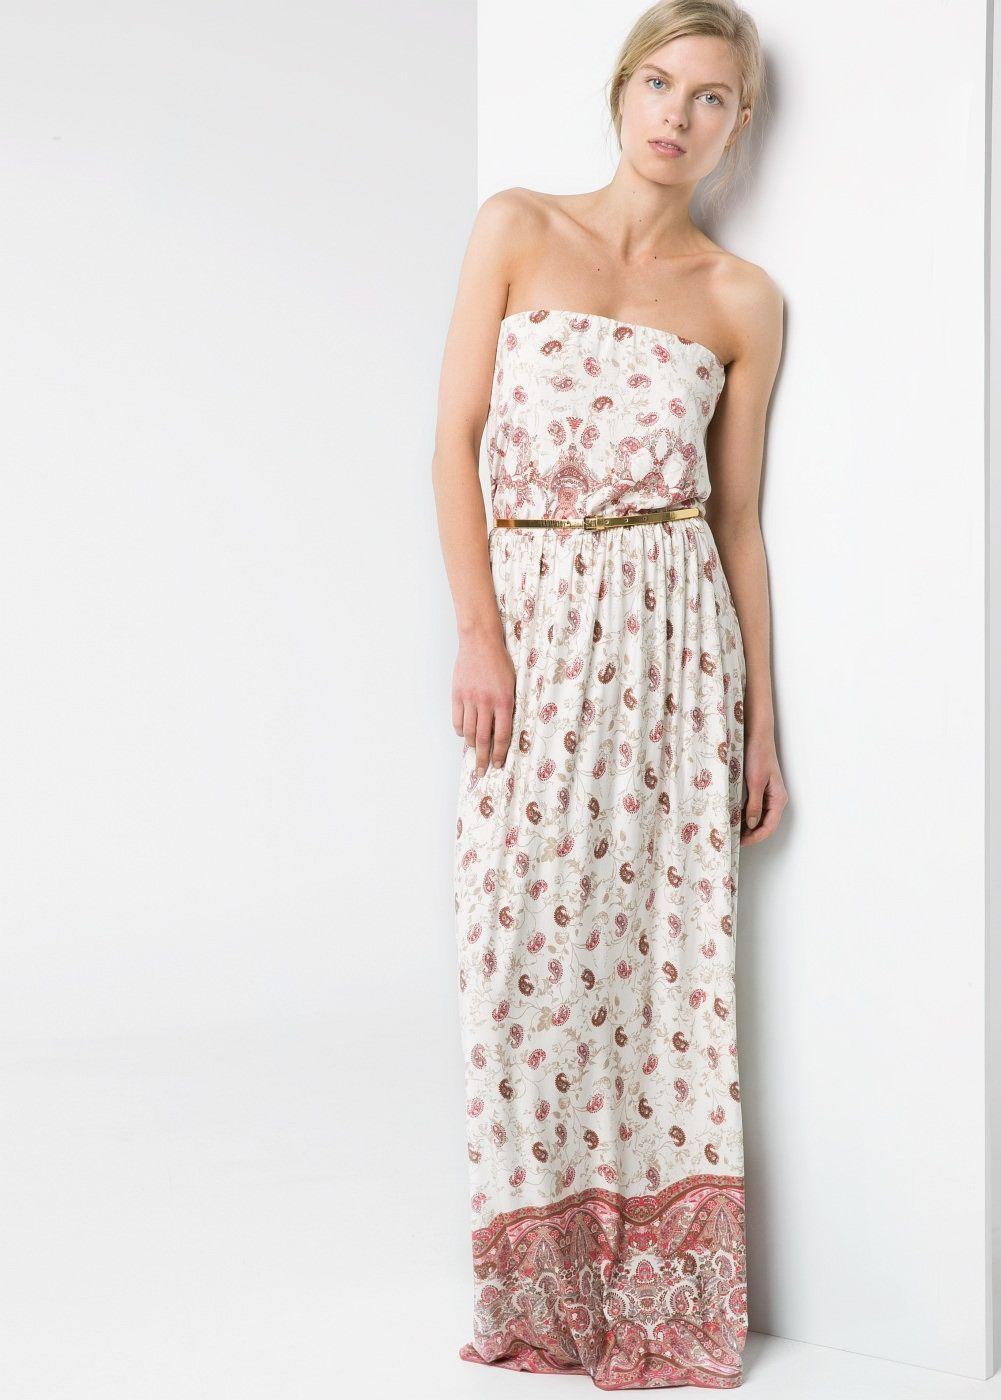 Strapless long dress - Woman  Mango Hong Kong  Strapless long